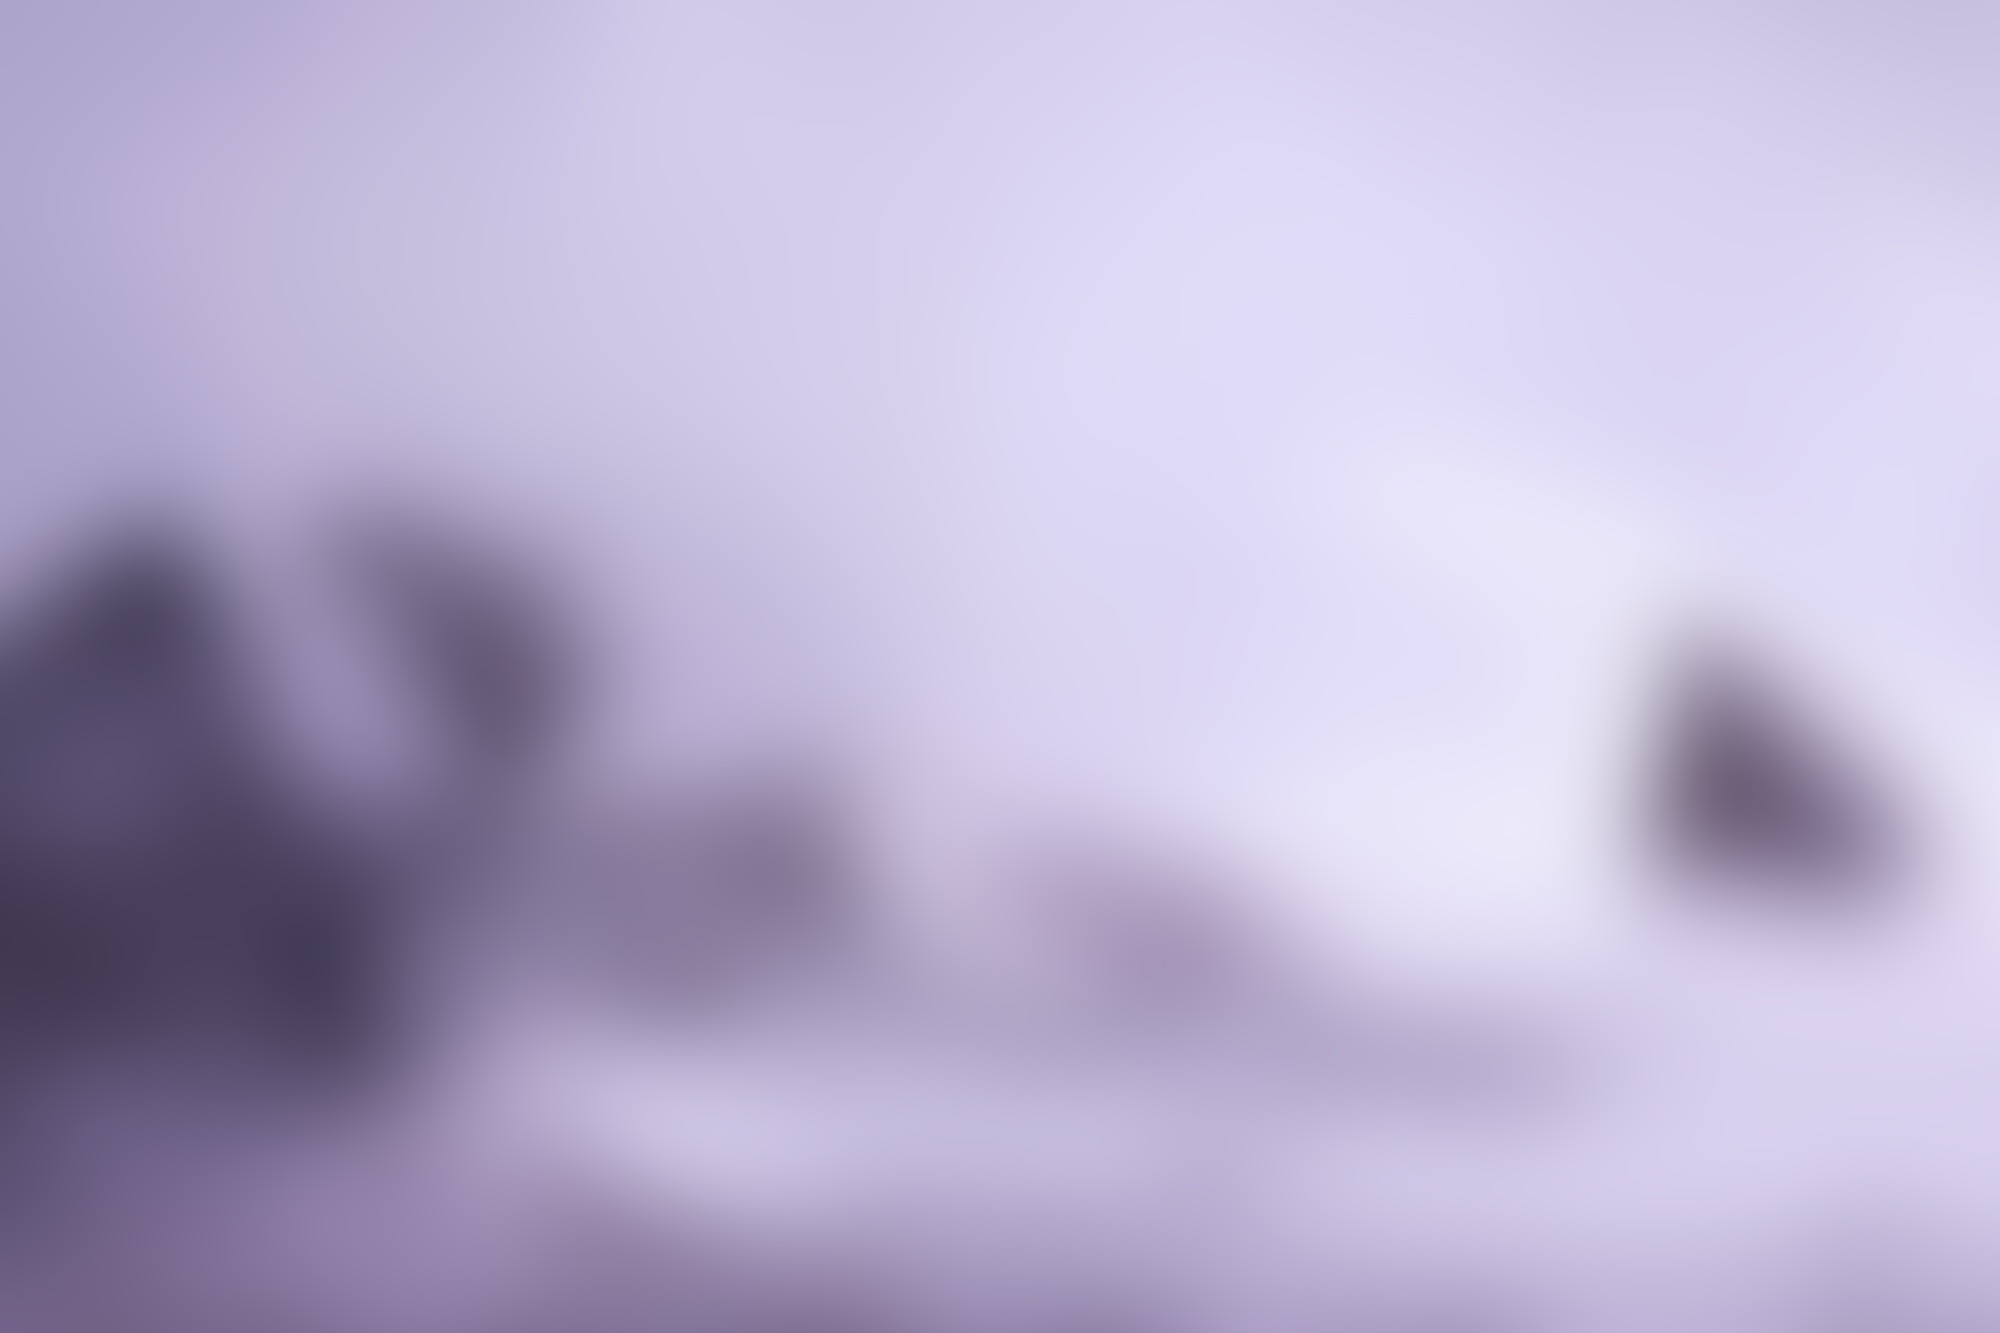 FORGE 3 WEB LUKE EVANS 2013 autocompressfitresizeixlibphp 1 1 0max h2000max w3 D2000q80s9d6b832ac51d138beafd570b81fd8b03